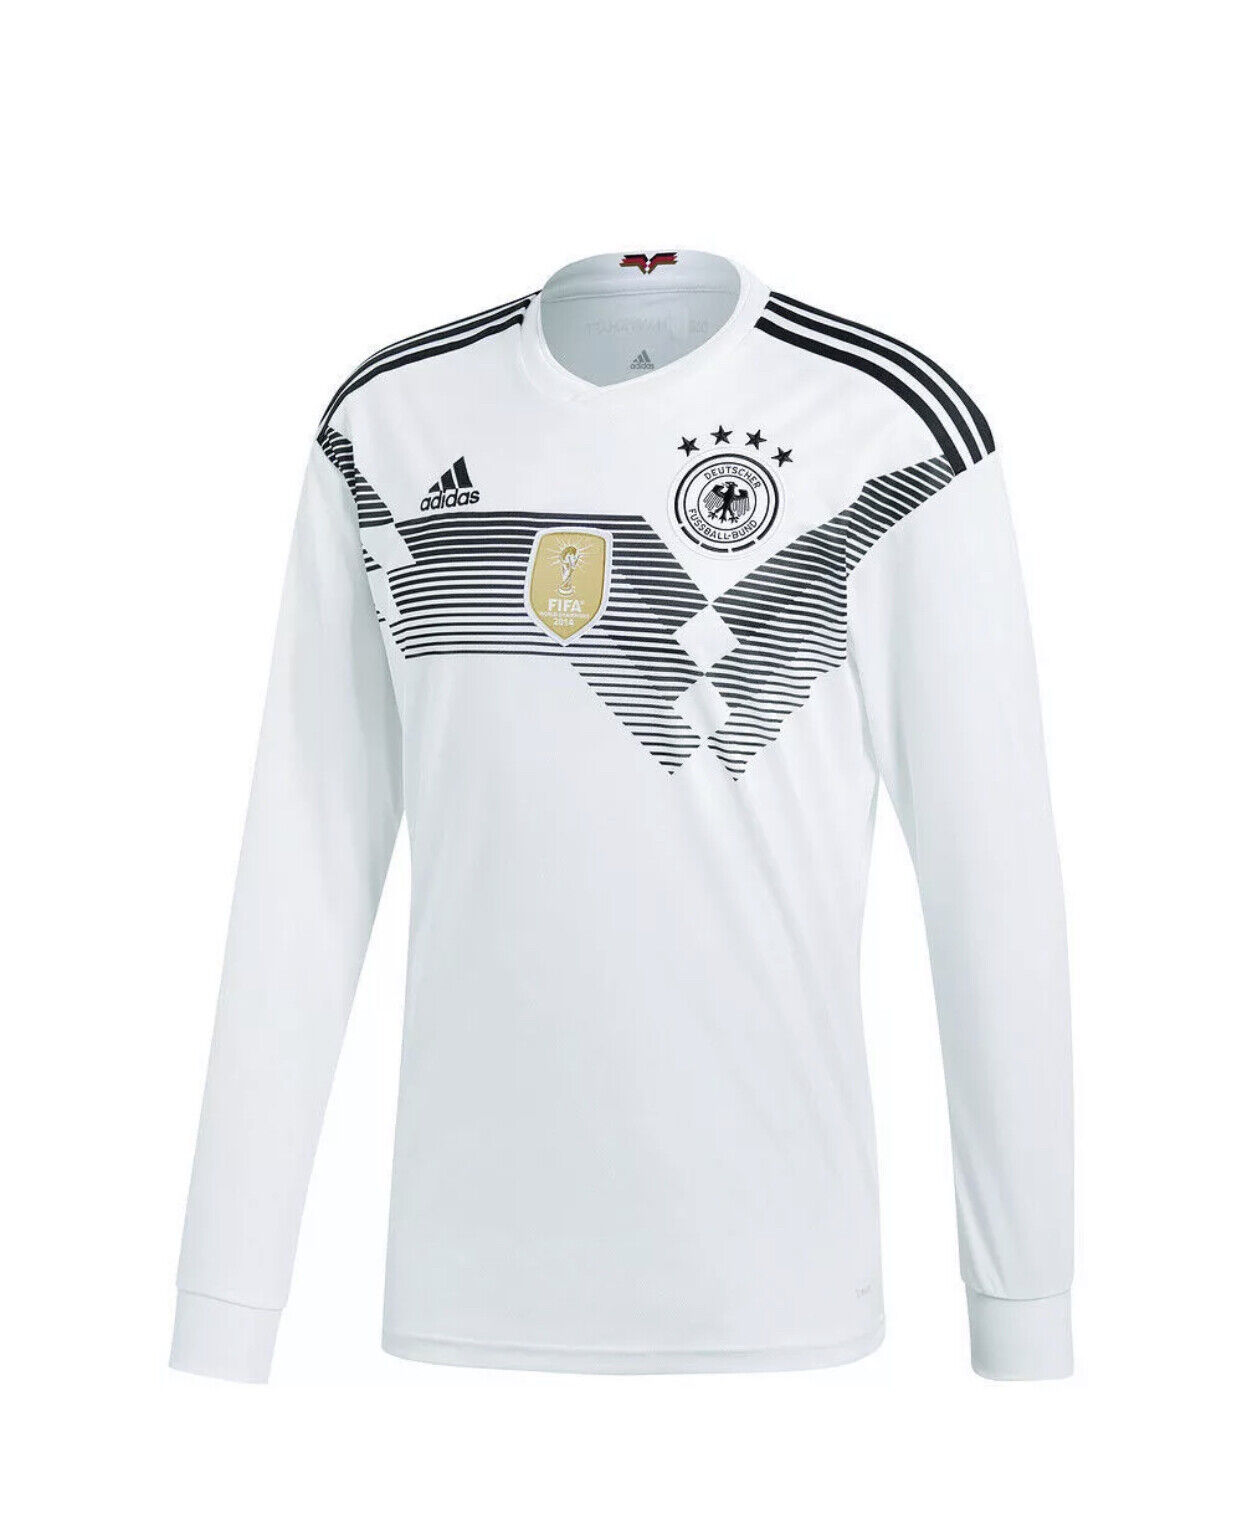 2018-2019 Camisa Mangas Largas  Adidas Alemania Home  Tienda 2018